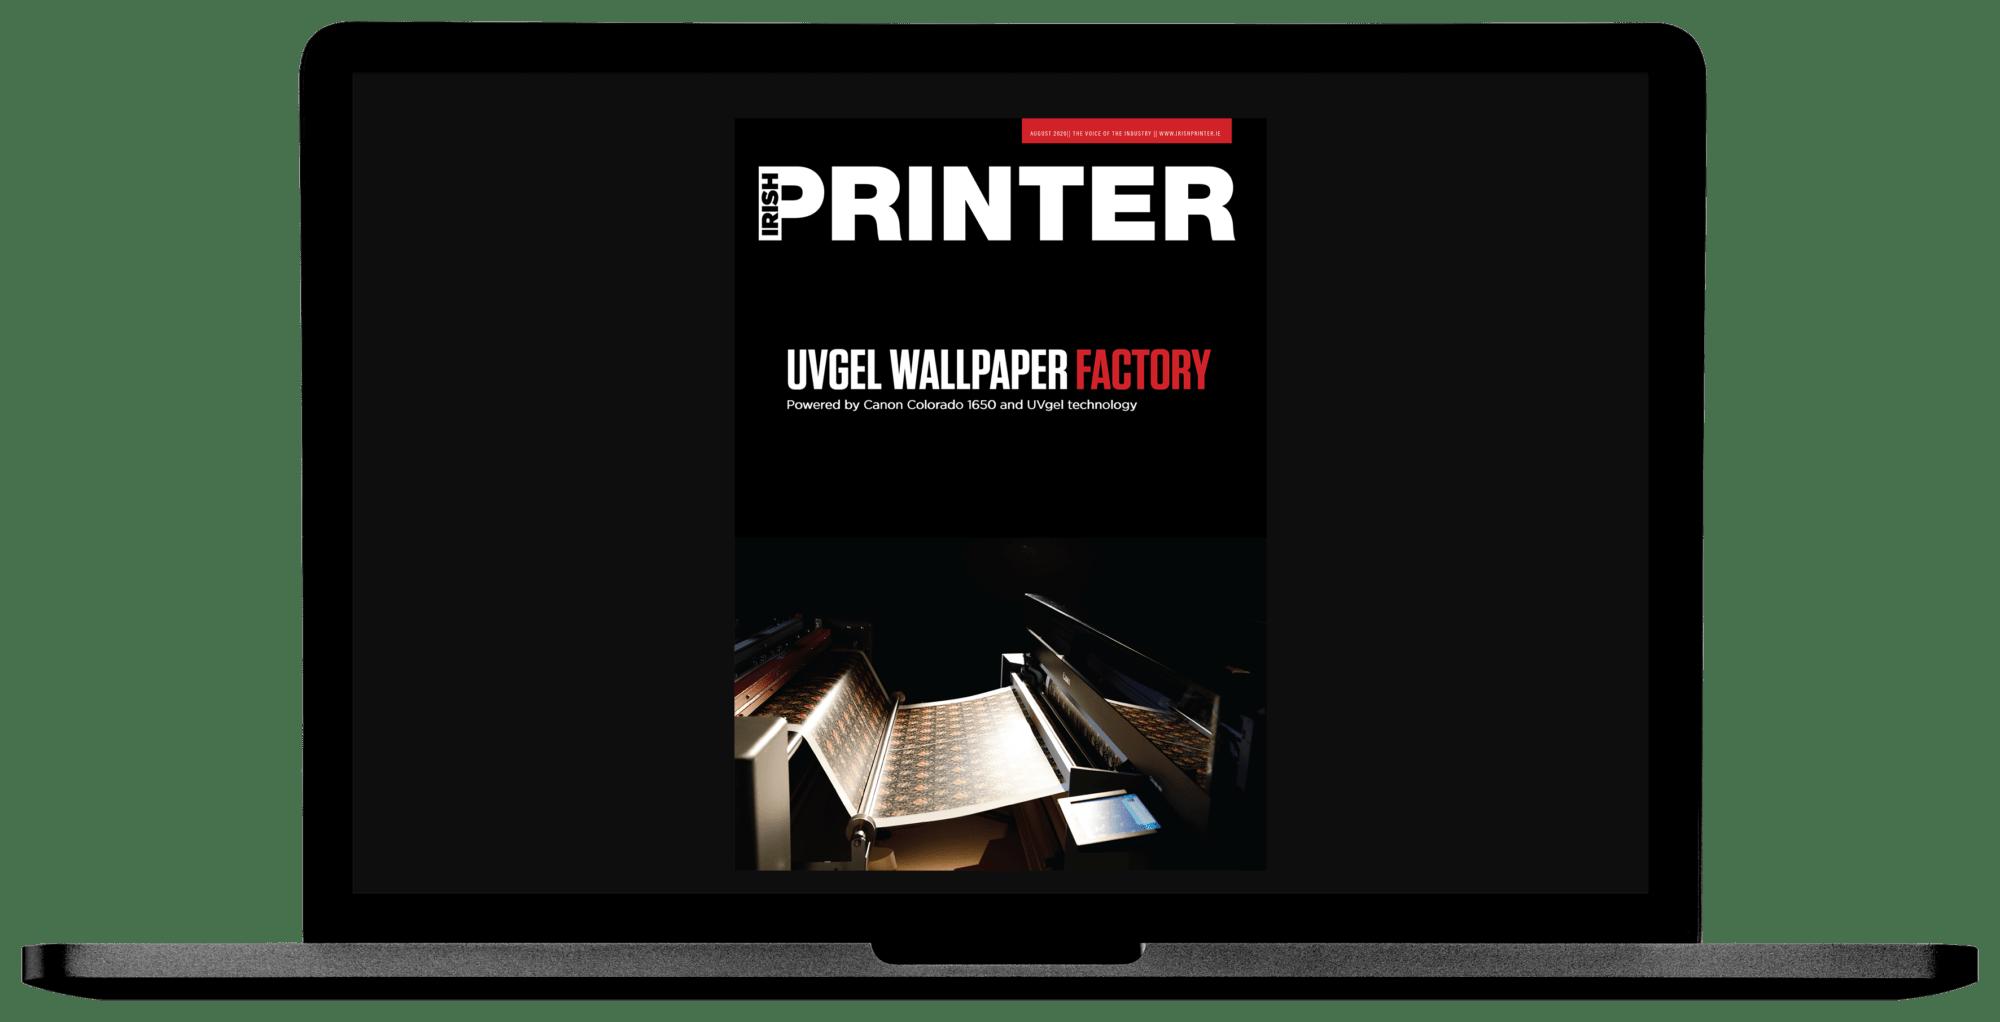 Irish Printer August 2020 - Laptop Spread